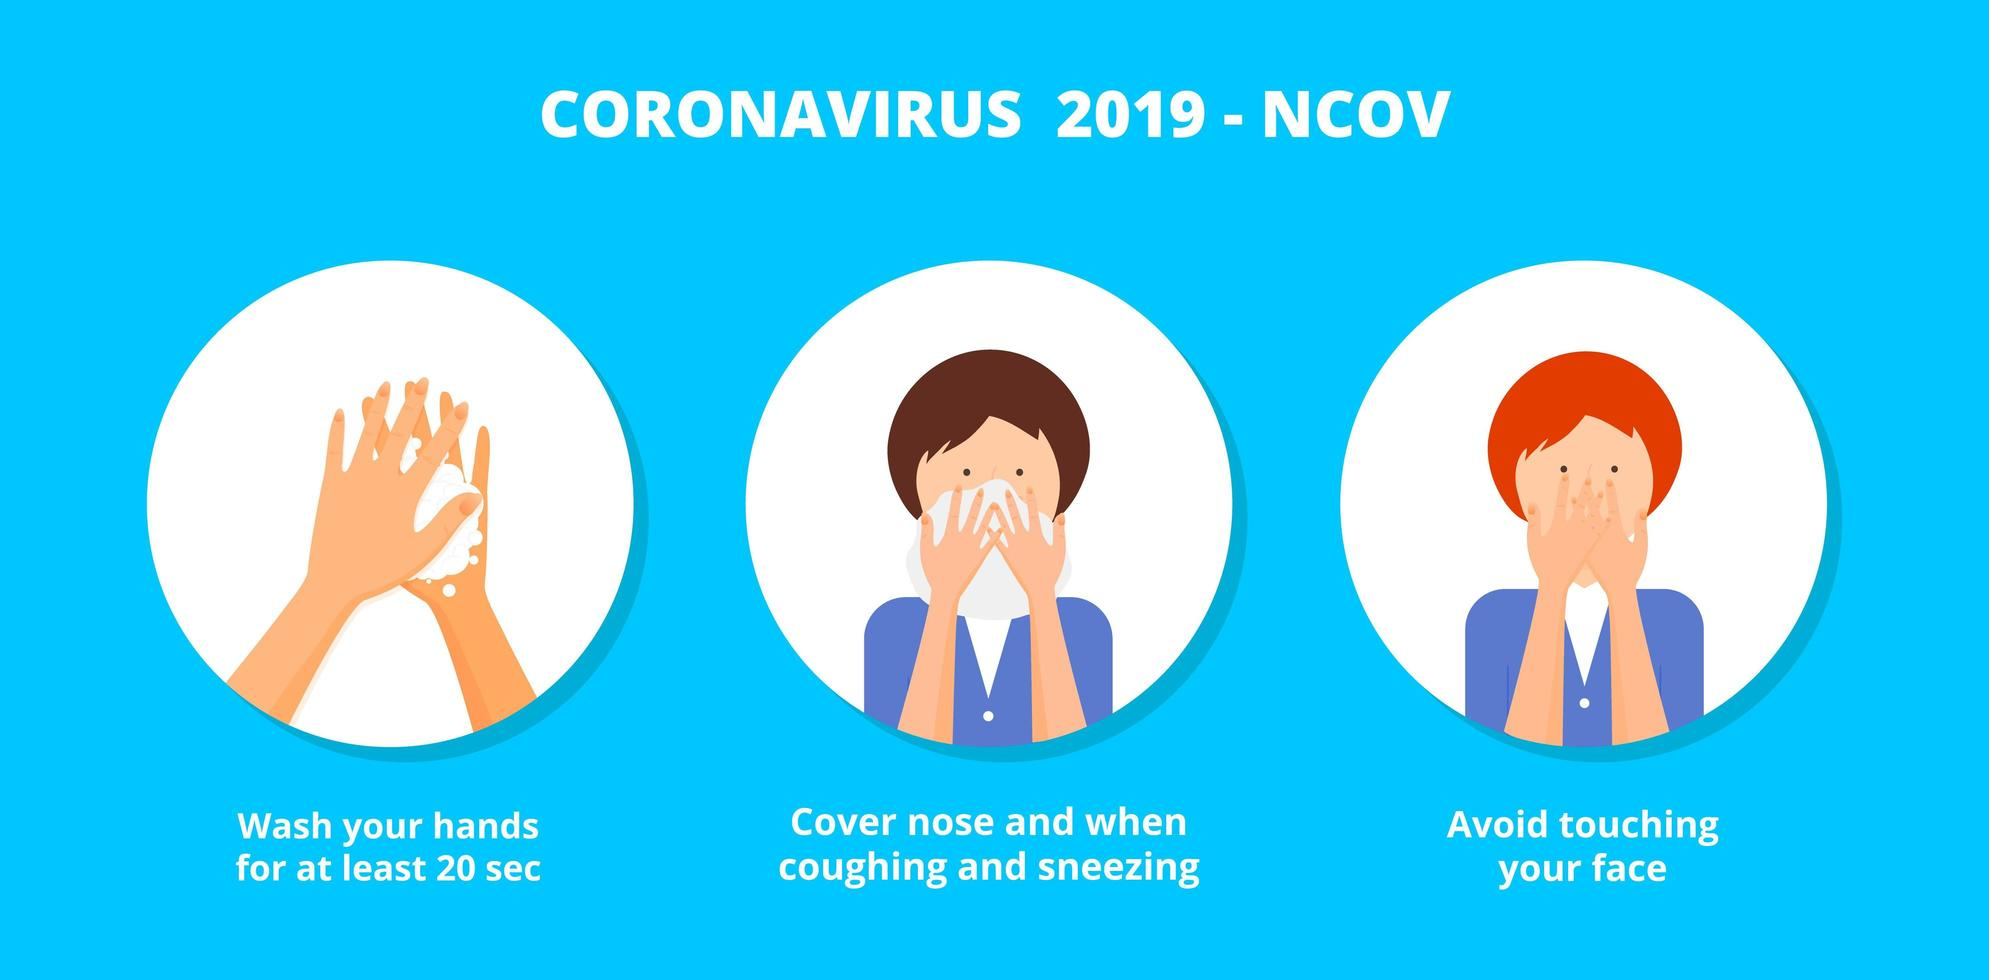 Infografik zur Prävention von Coronavirus-Covid-19. vektor